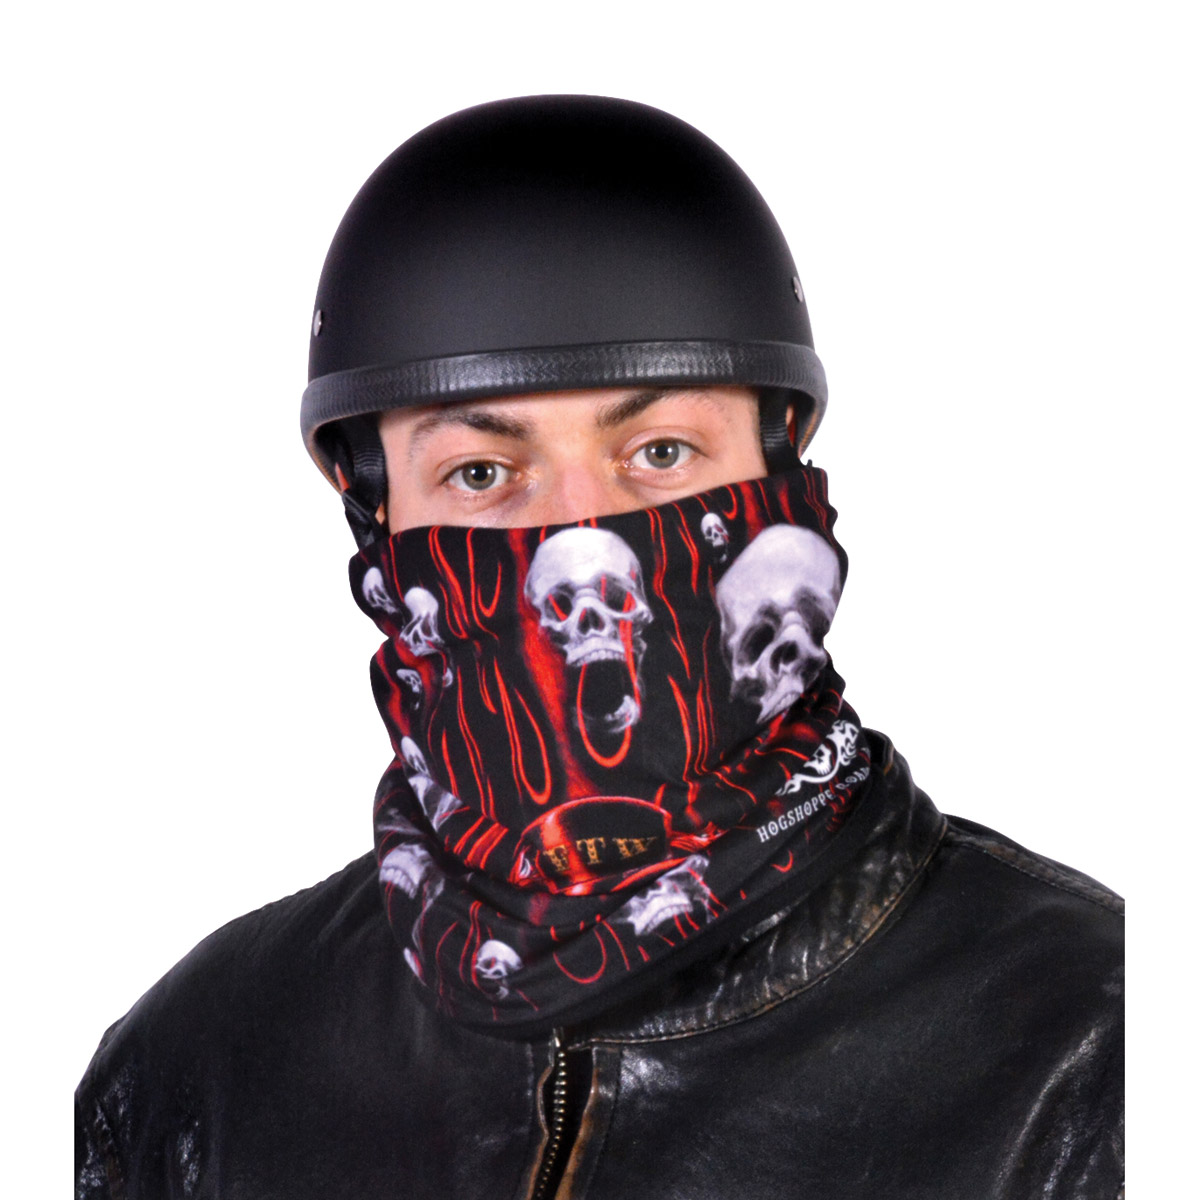 Hogshoppe FTW Skulls Fleece Lined Stretch Tube